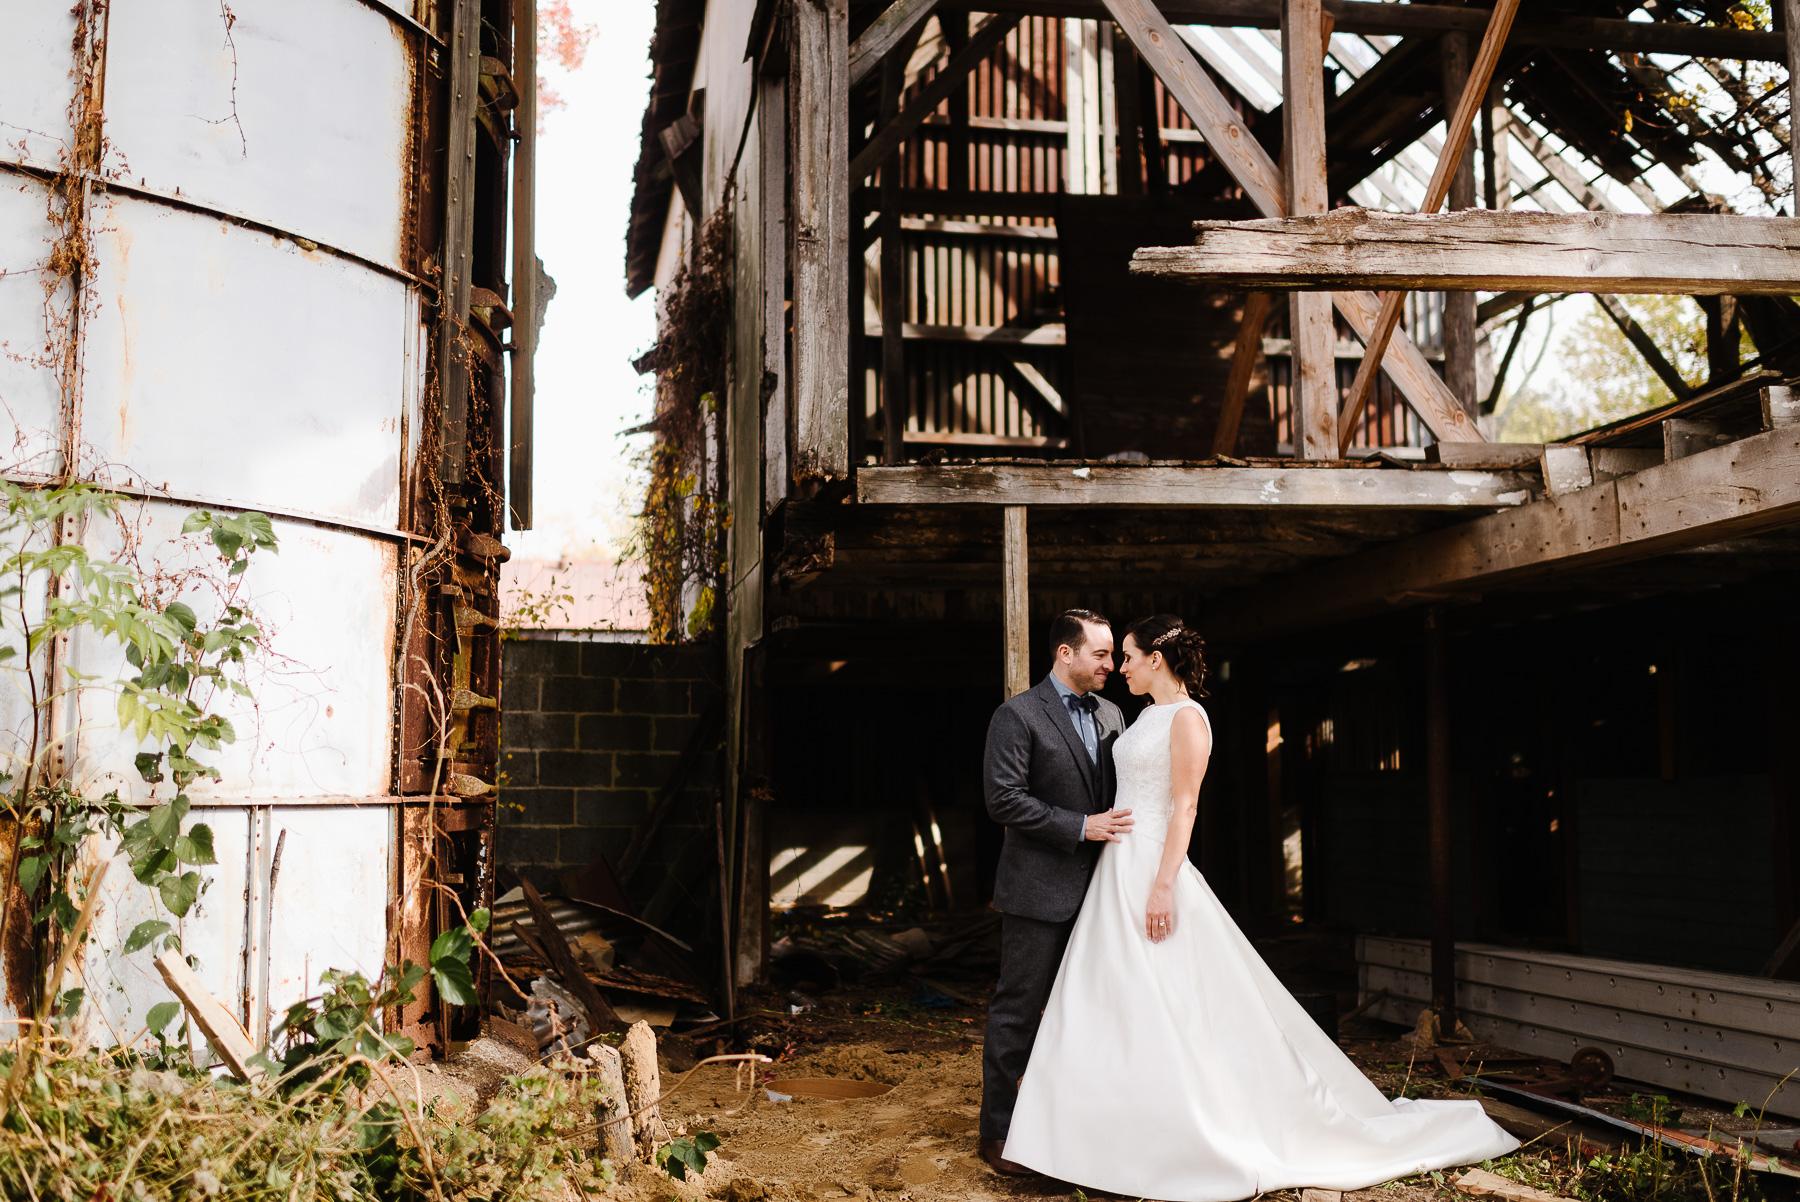 31-Laurita Winery Wedding New Jersey Wedding Photographer Laurita Winery Weddings Longbrook Photography.jpg